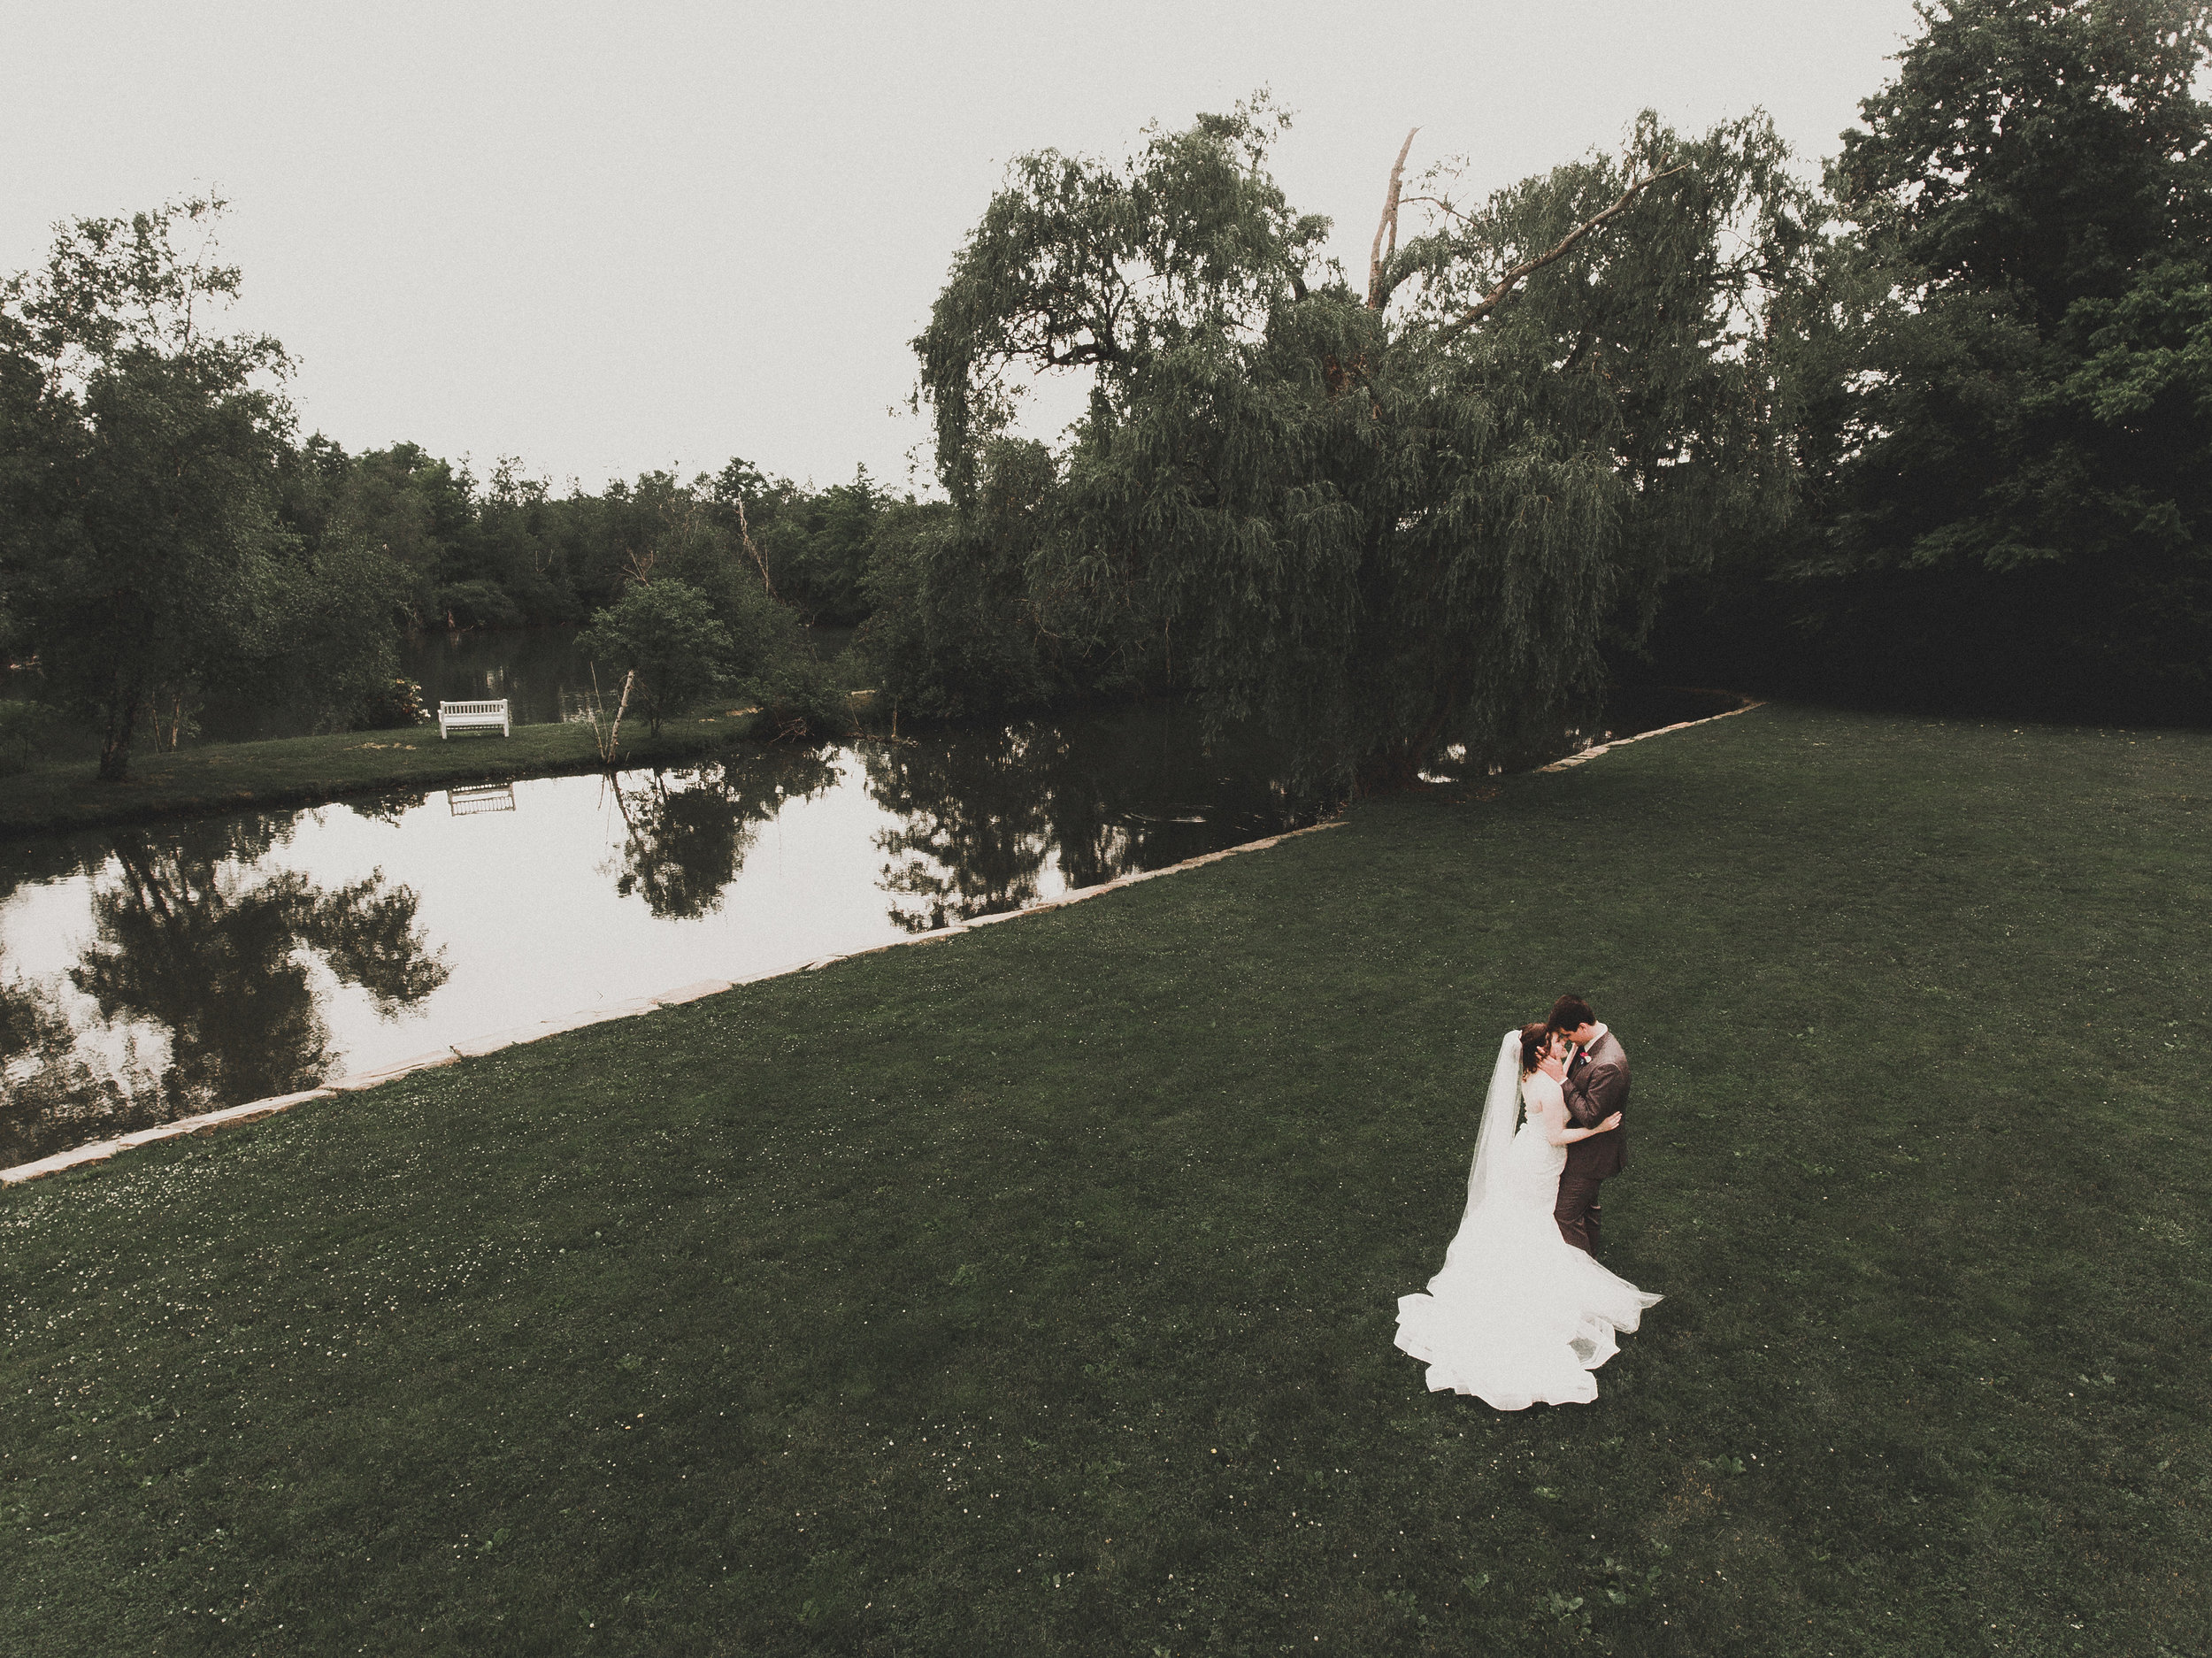 PITTSBURGH WEDDING PHOTOGRAPHER -DJI_0014-2.jpg